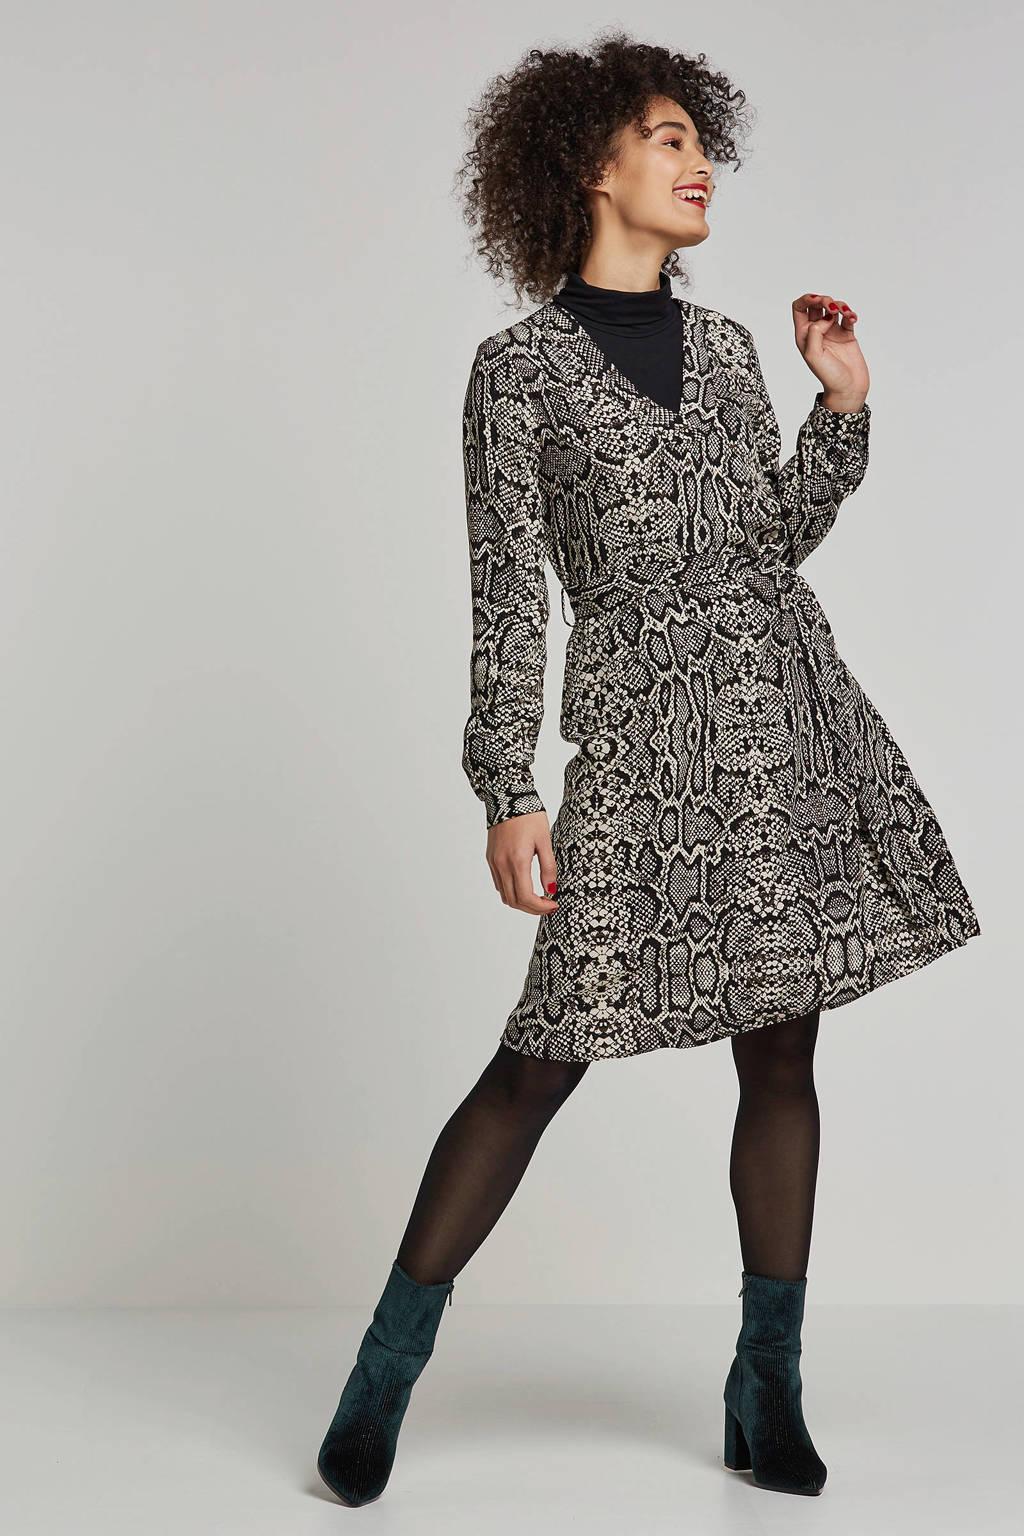 OBJECT jurk met slangen print, Zwart/wit/groen